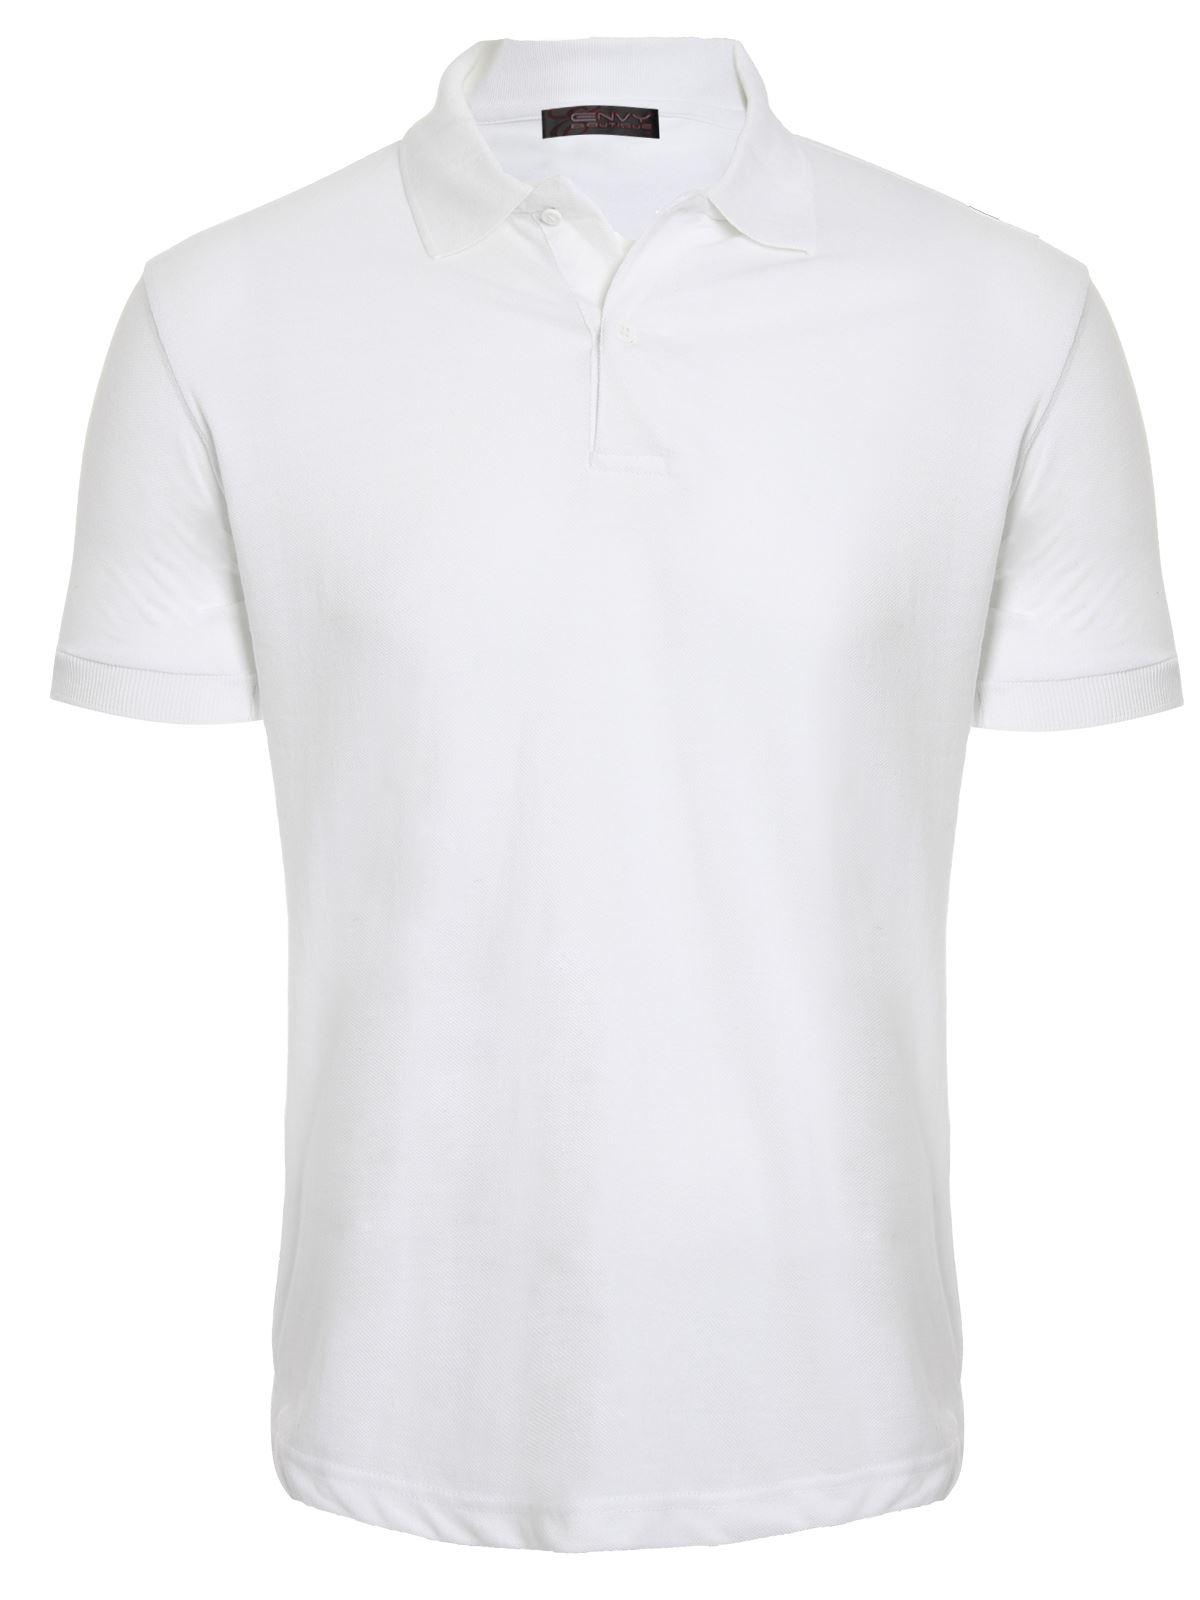 Mens Womens Unisex Plain Casual Short Sleeve Polo Shirt ...